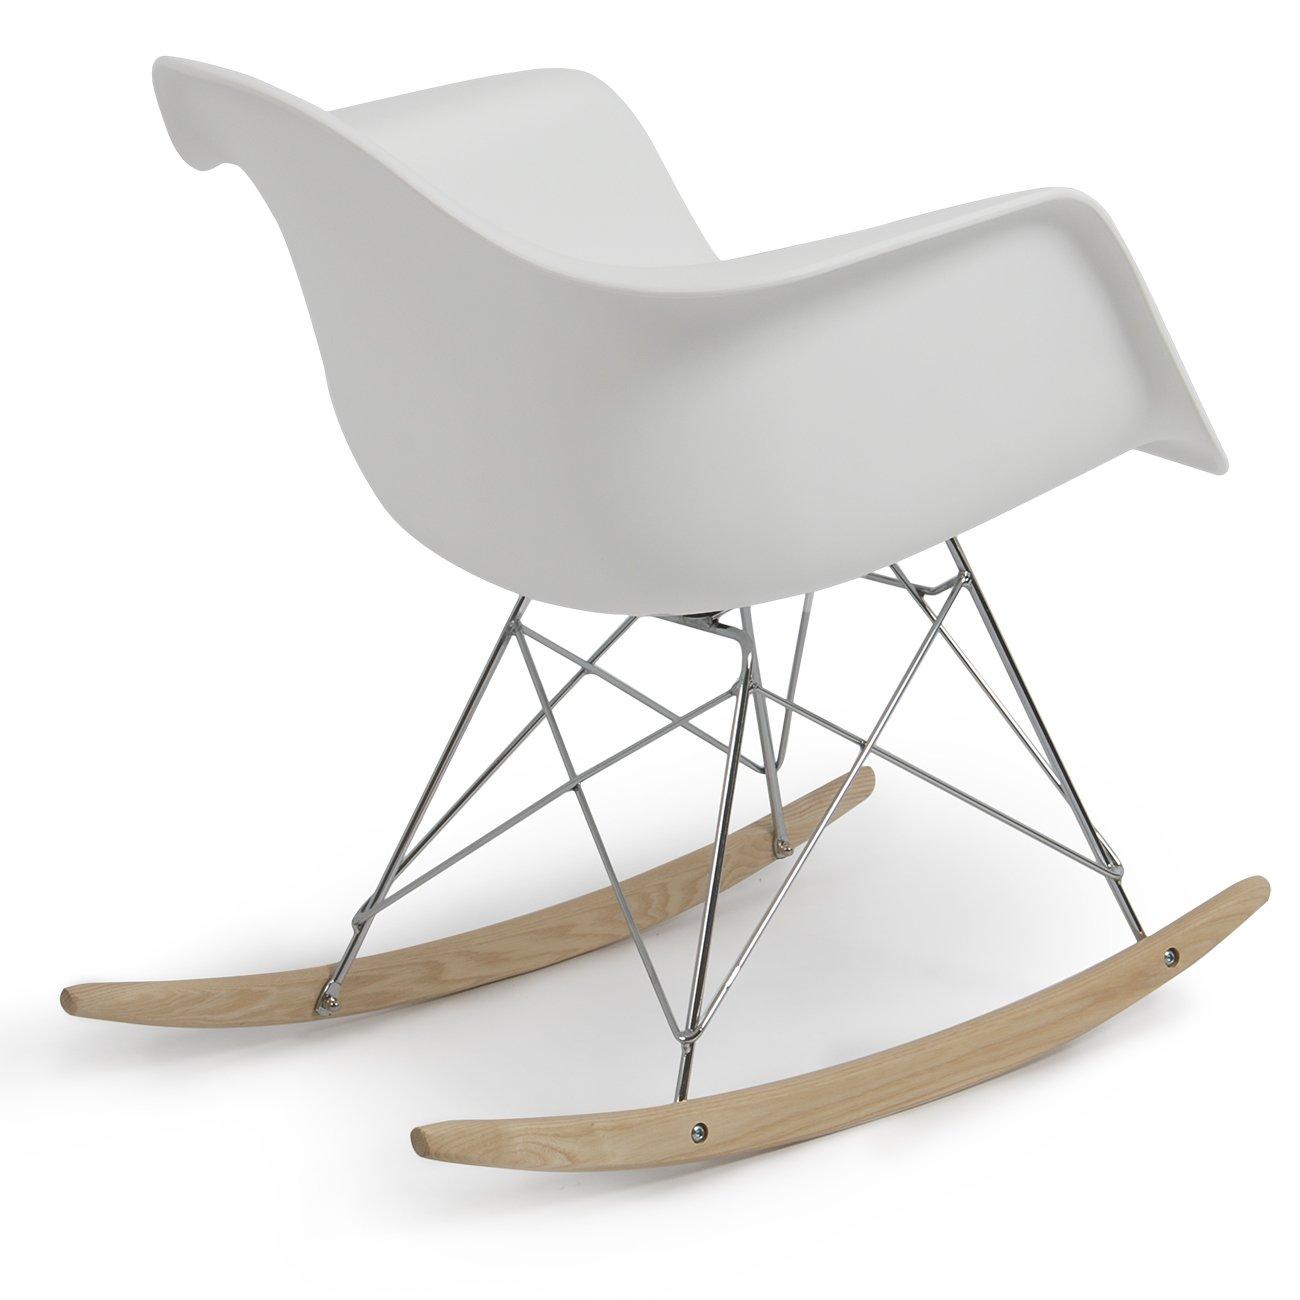 Rar rocking chairs eames style rar rocking arm chair grey - Amazon Com Belleze Mid Century Style Rocking Retro Rocking Chair Mid Century Nursery Living Room Cradle White Kitchen Dining